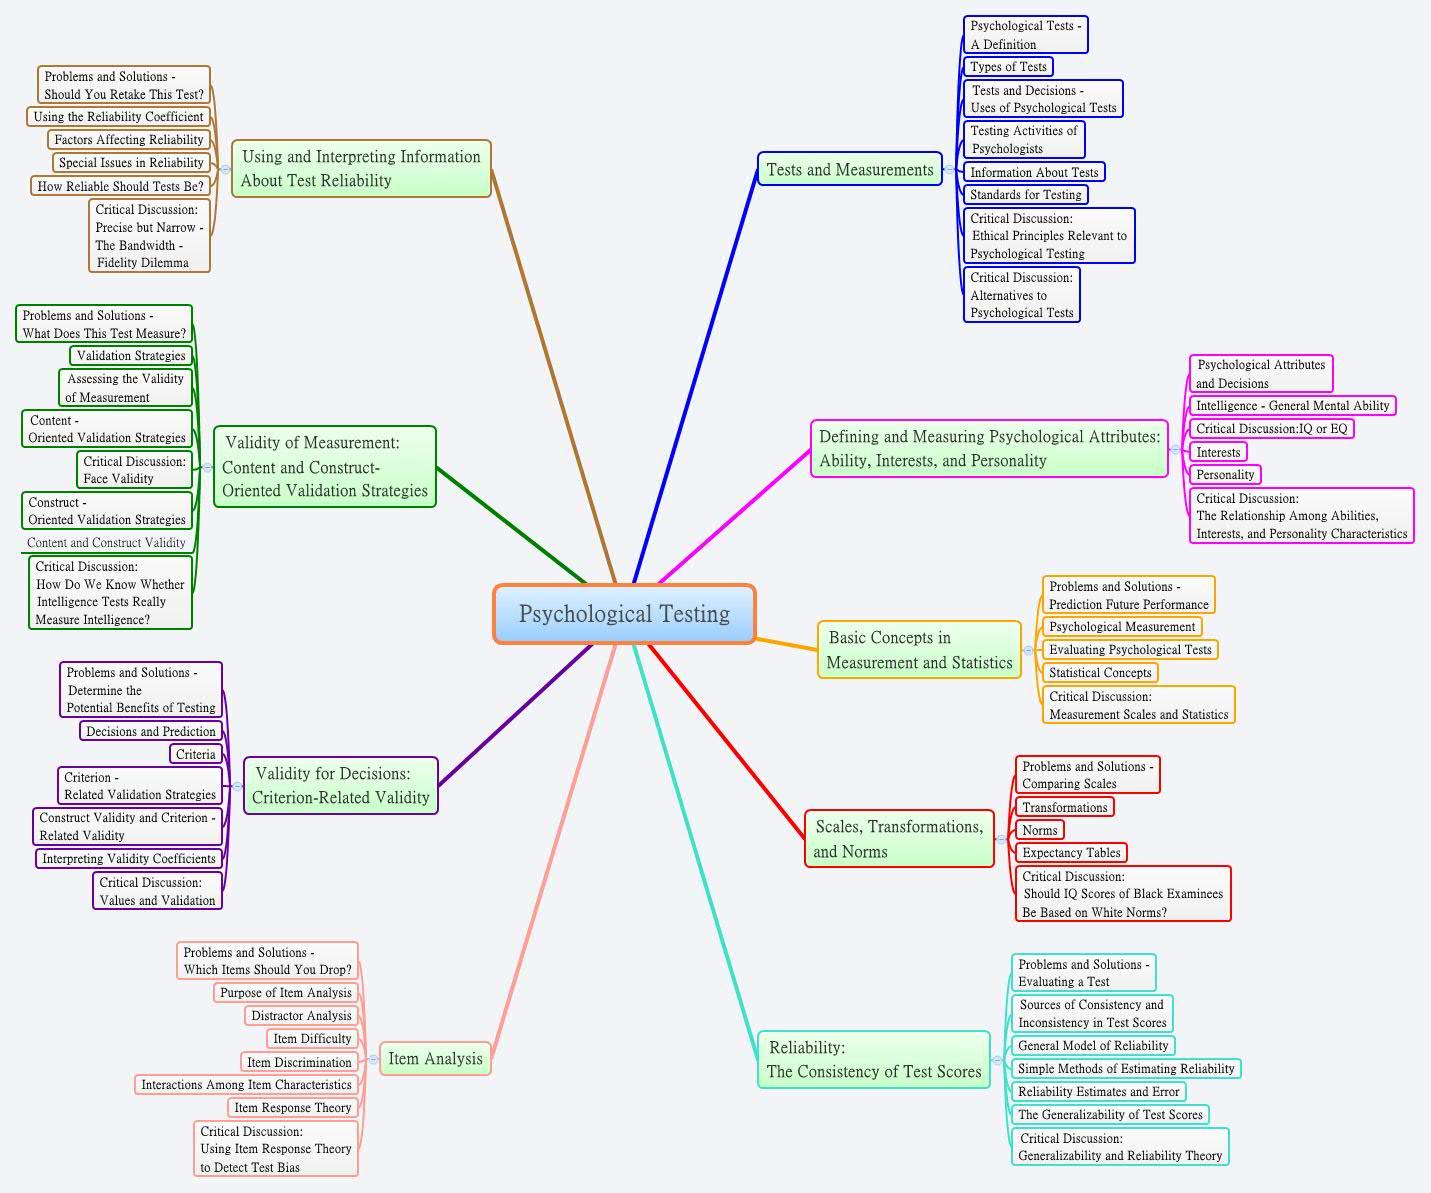 Psych testing | Coursework Sample - oxassignmentyjua thinkaccuracy us